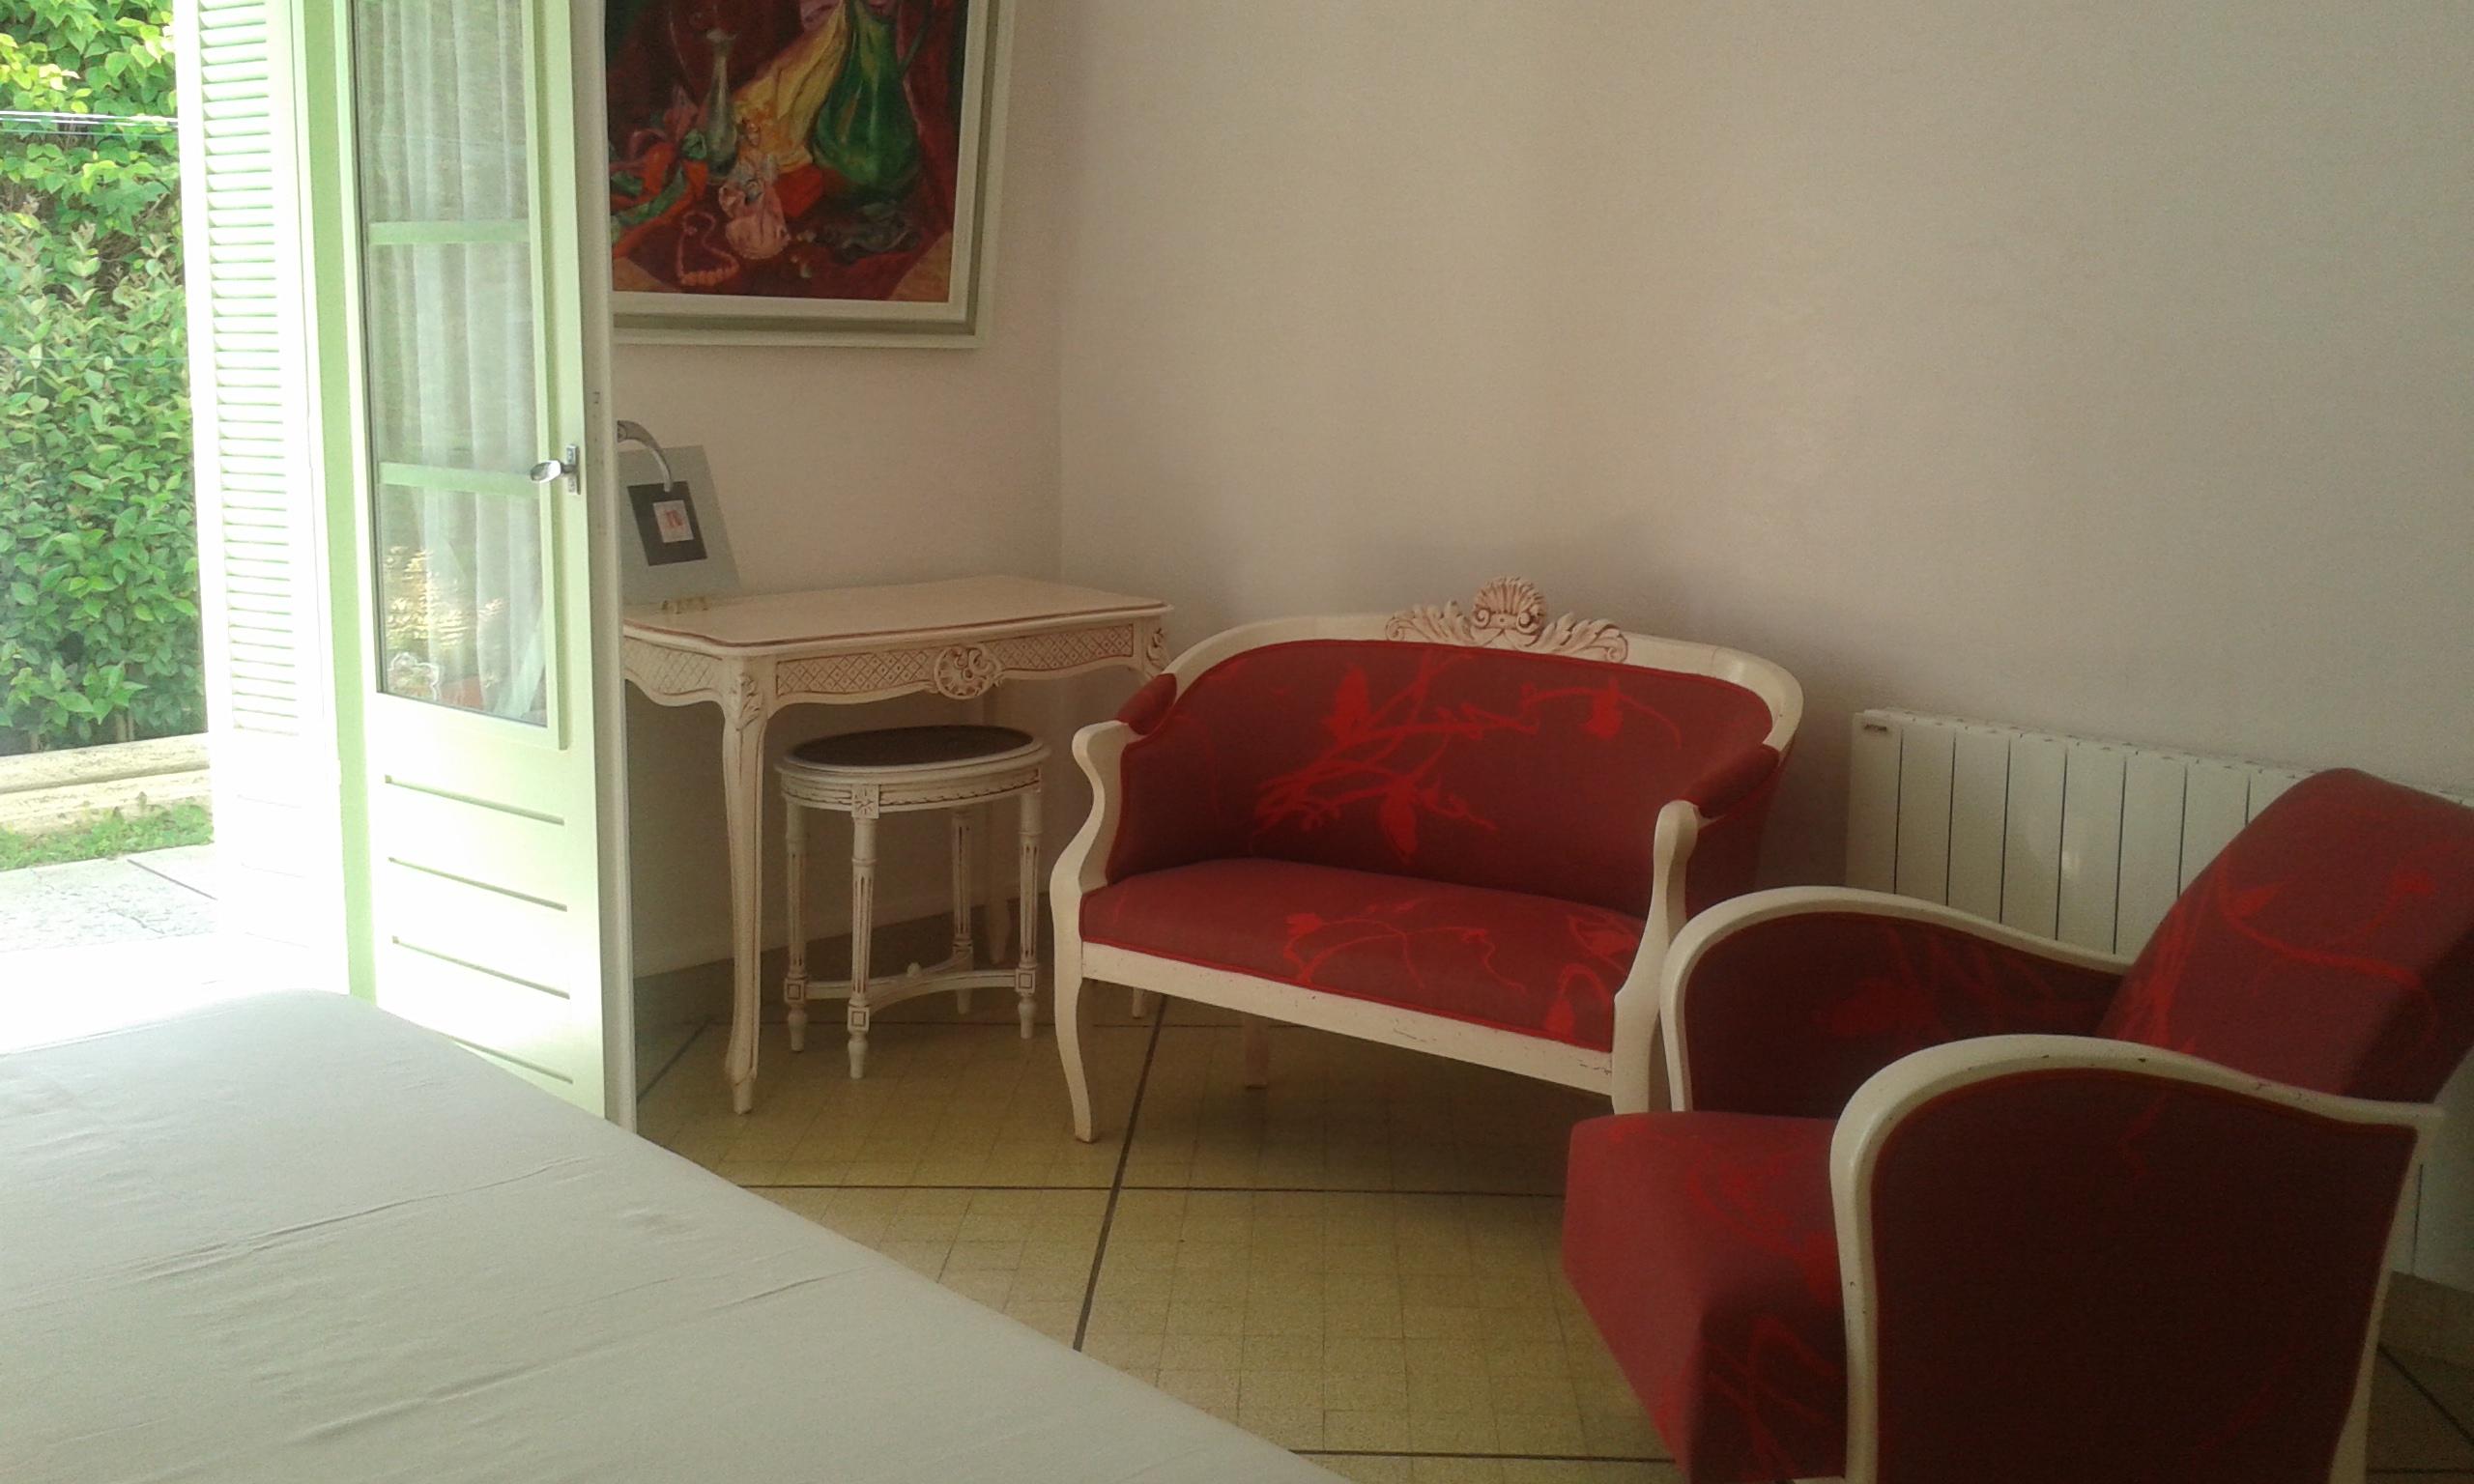 Chambre garance chambres d 39 h tes de charme aix en provence - Chambre d hotes salon de provence ...